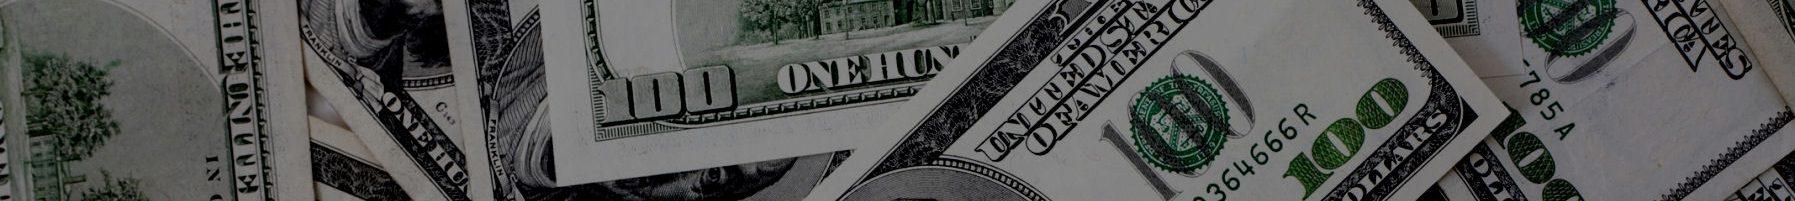 dollars image